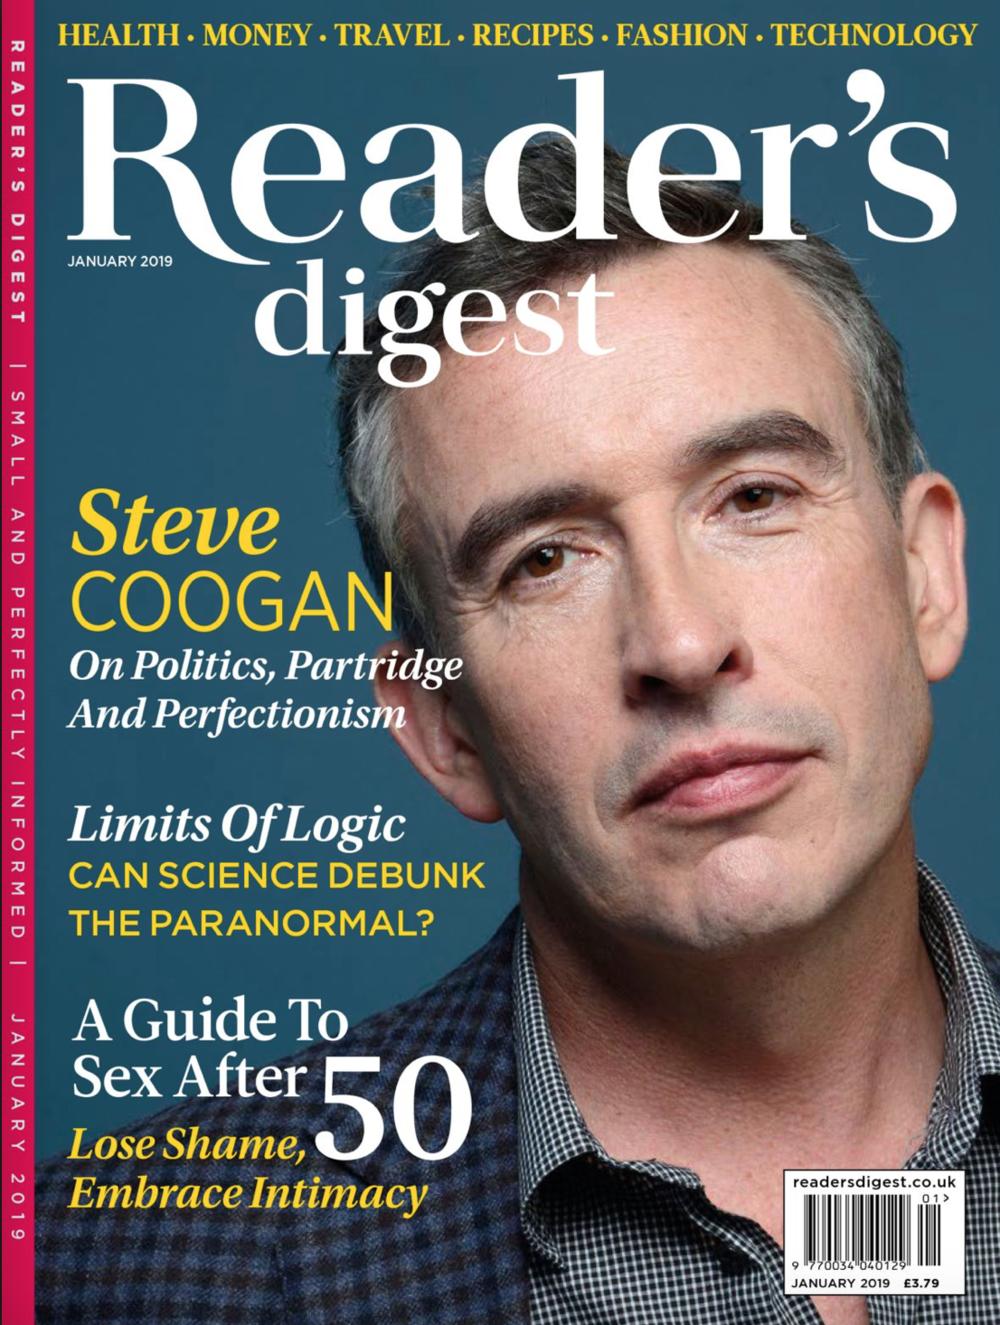 UK Reader's Digest | January 2019